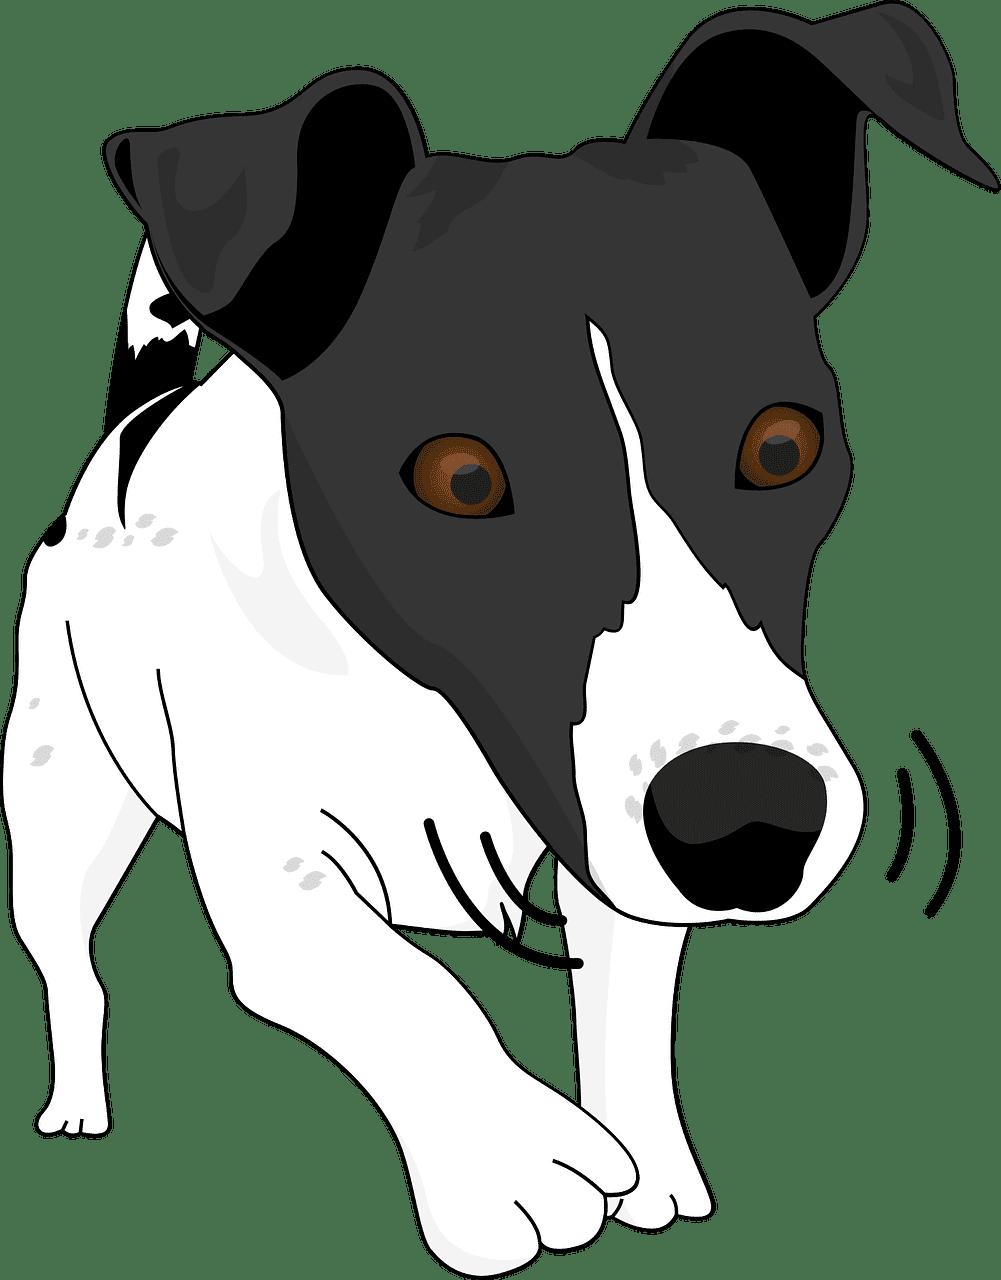 Puppy clipart transparent background 4